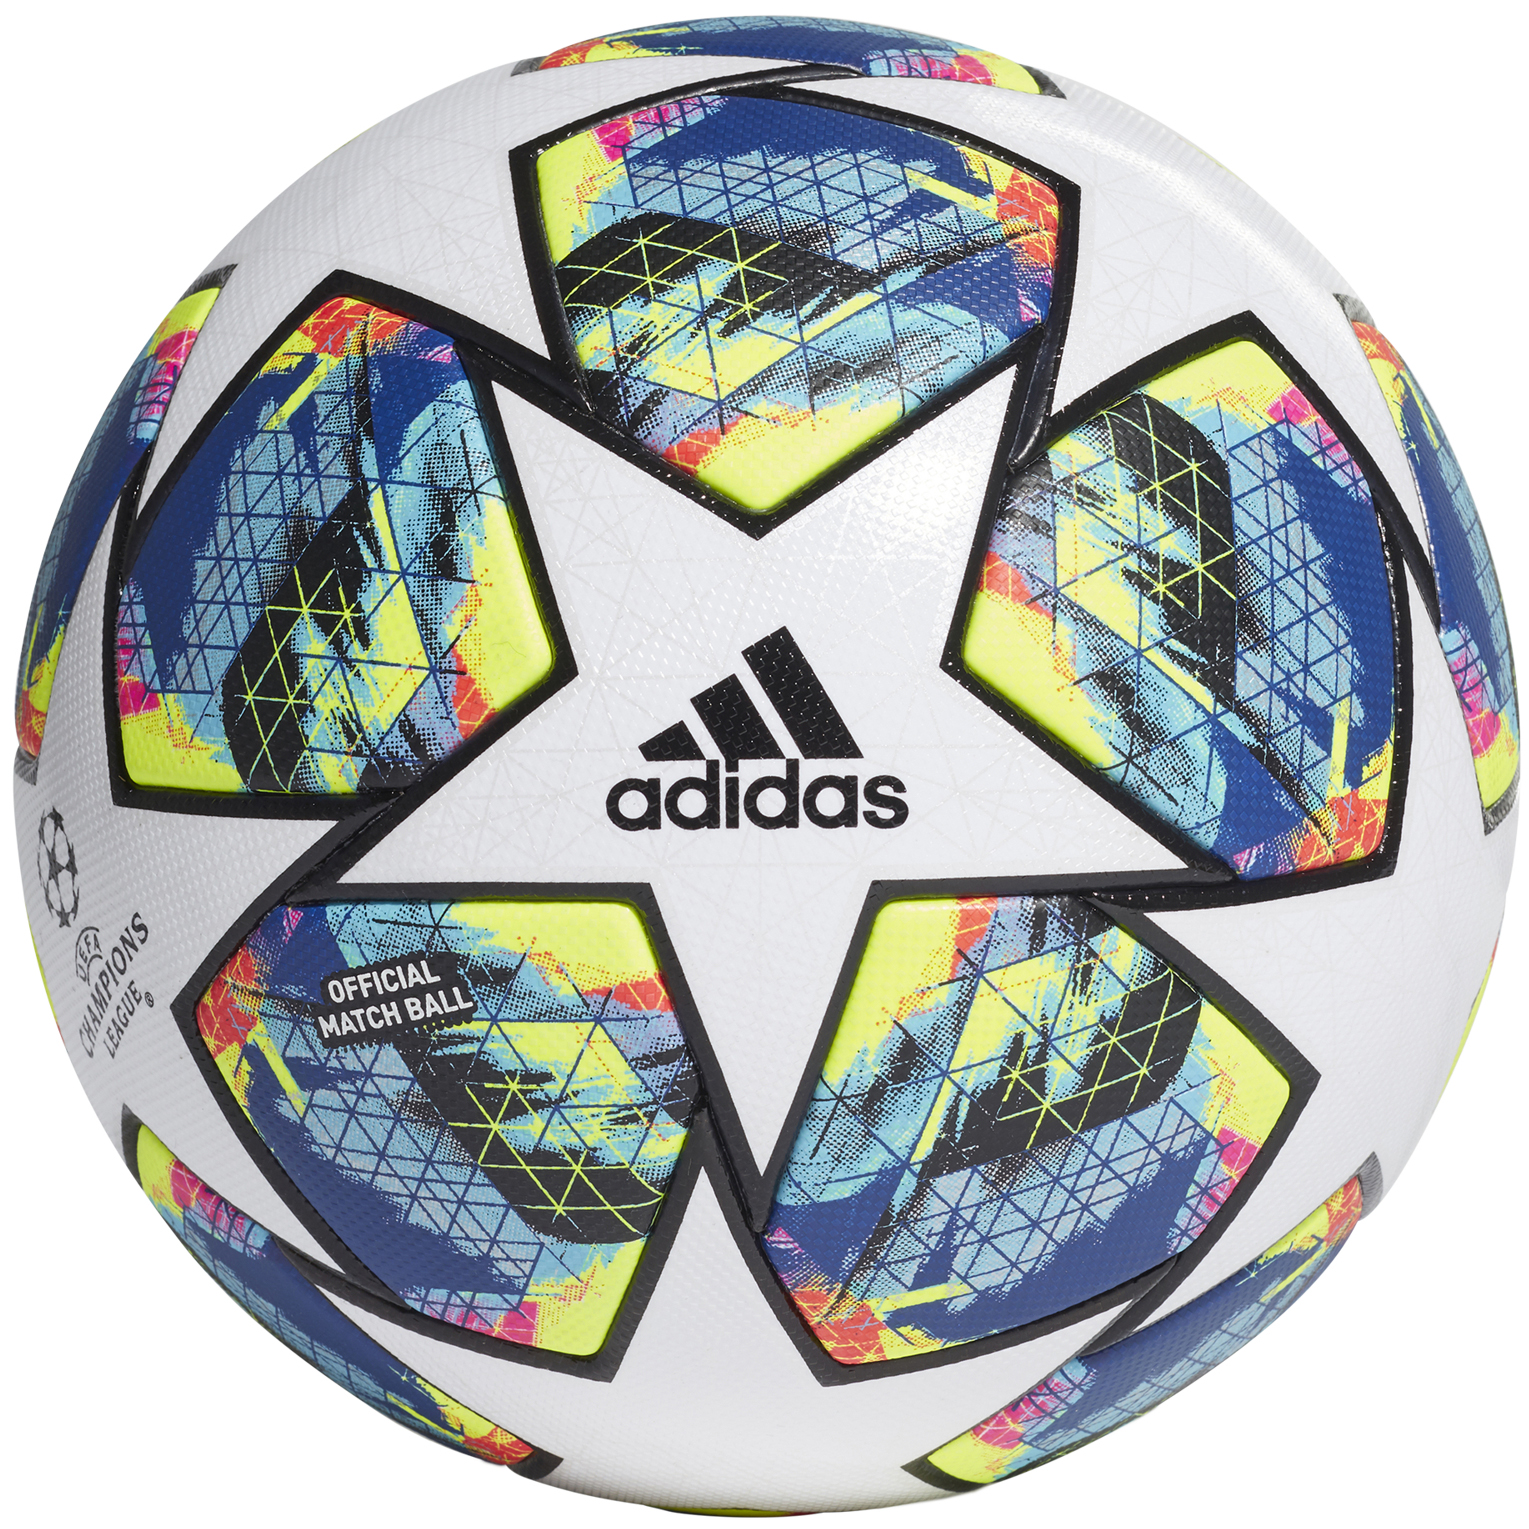 AKCE ADIDAS sada 3 míčů Finale 19 OMB